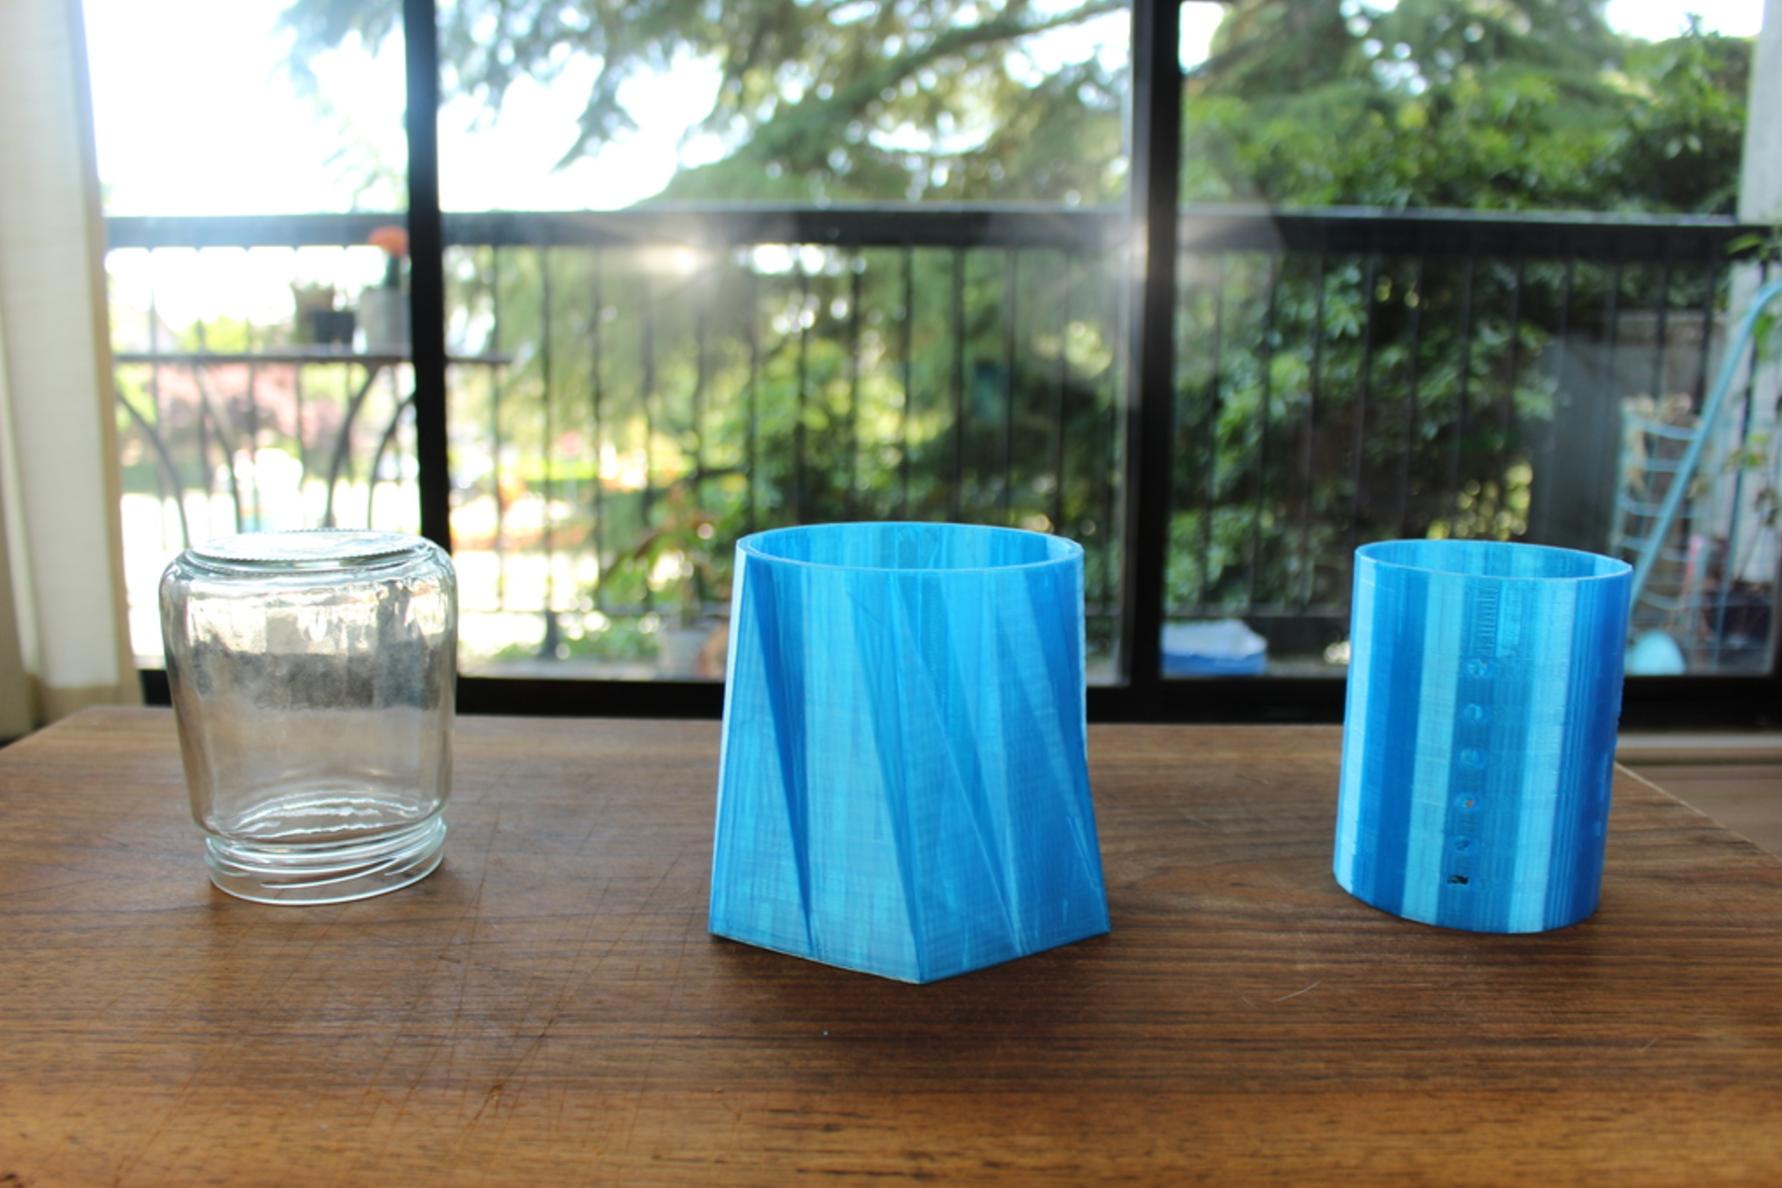 Invernadero Mini DIY3.png Download free STL file Greenhouse Mini DIY • 3D printer object, Gonzalor